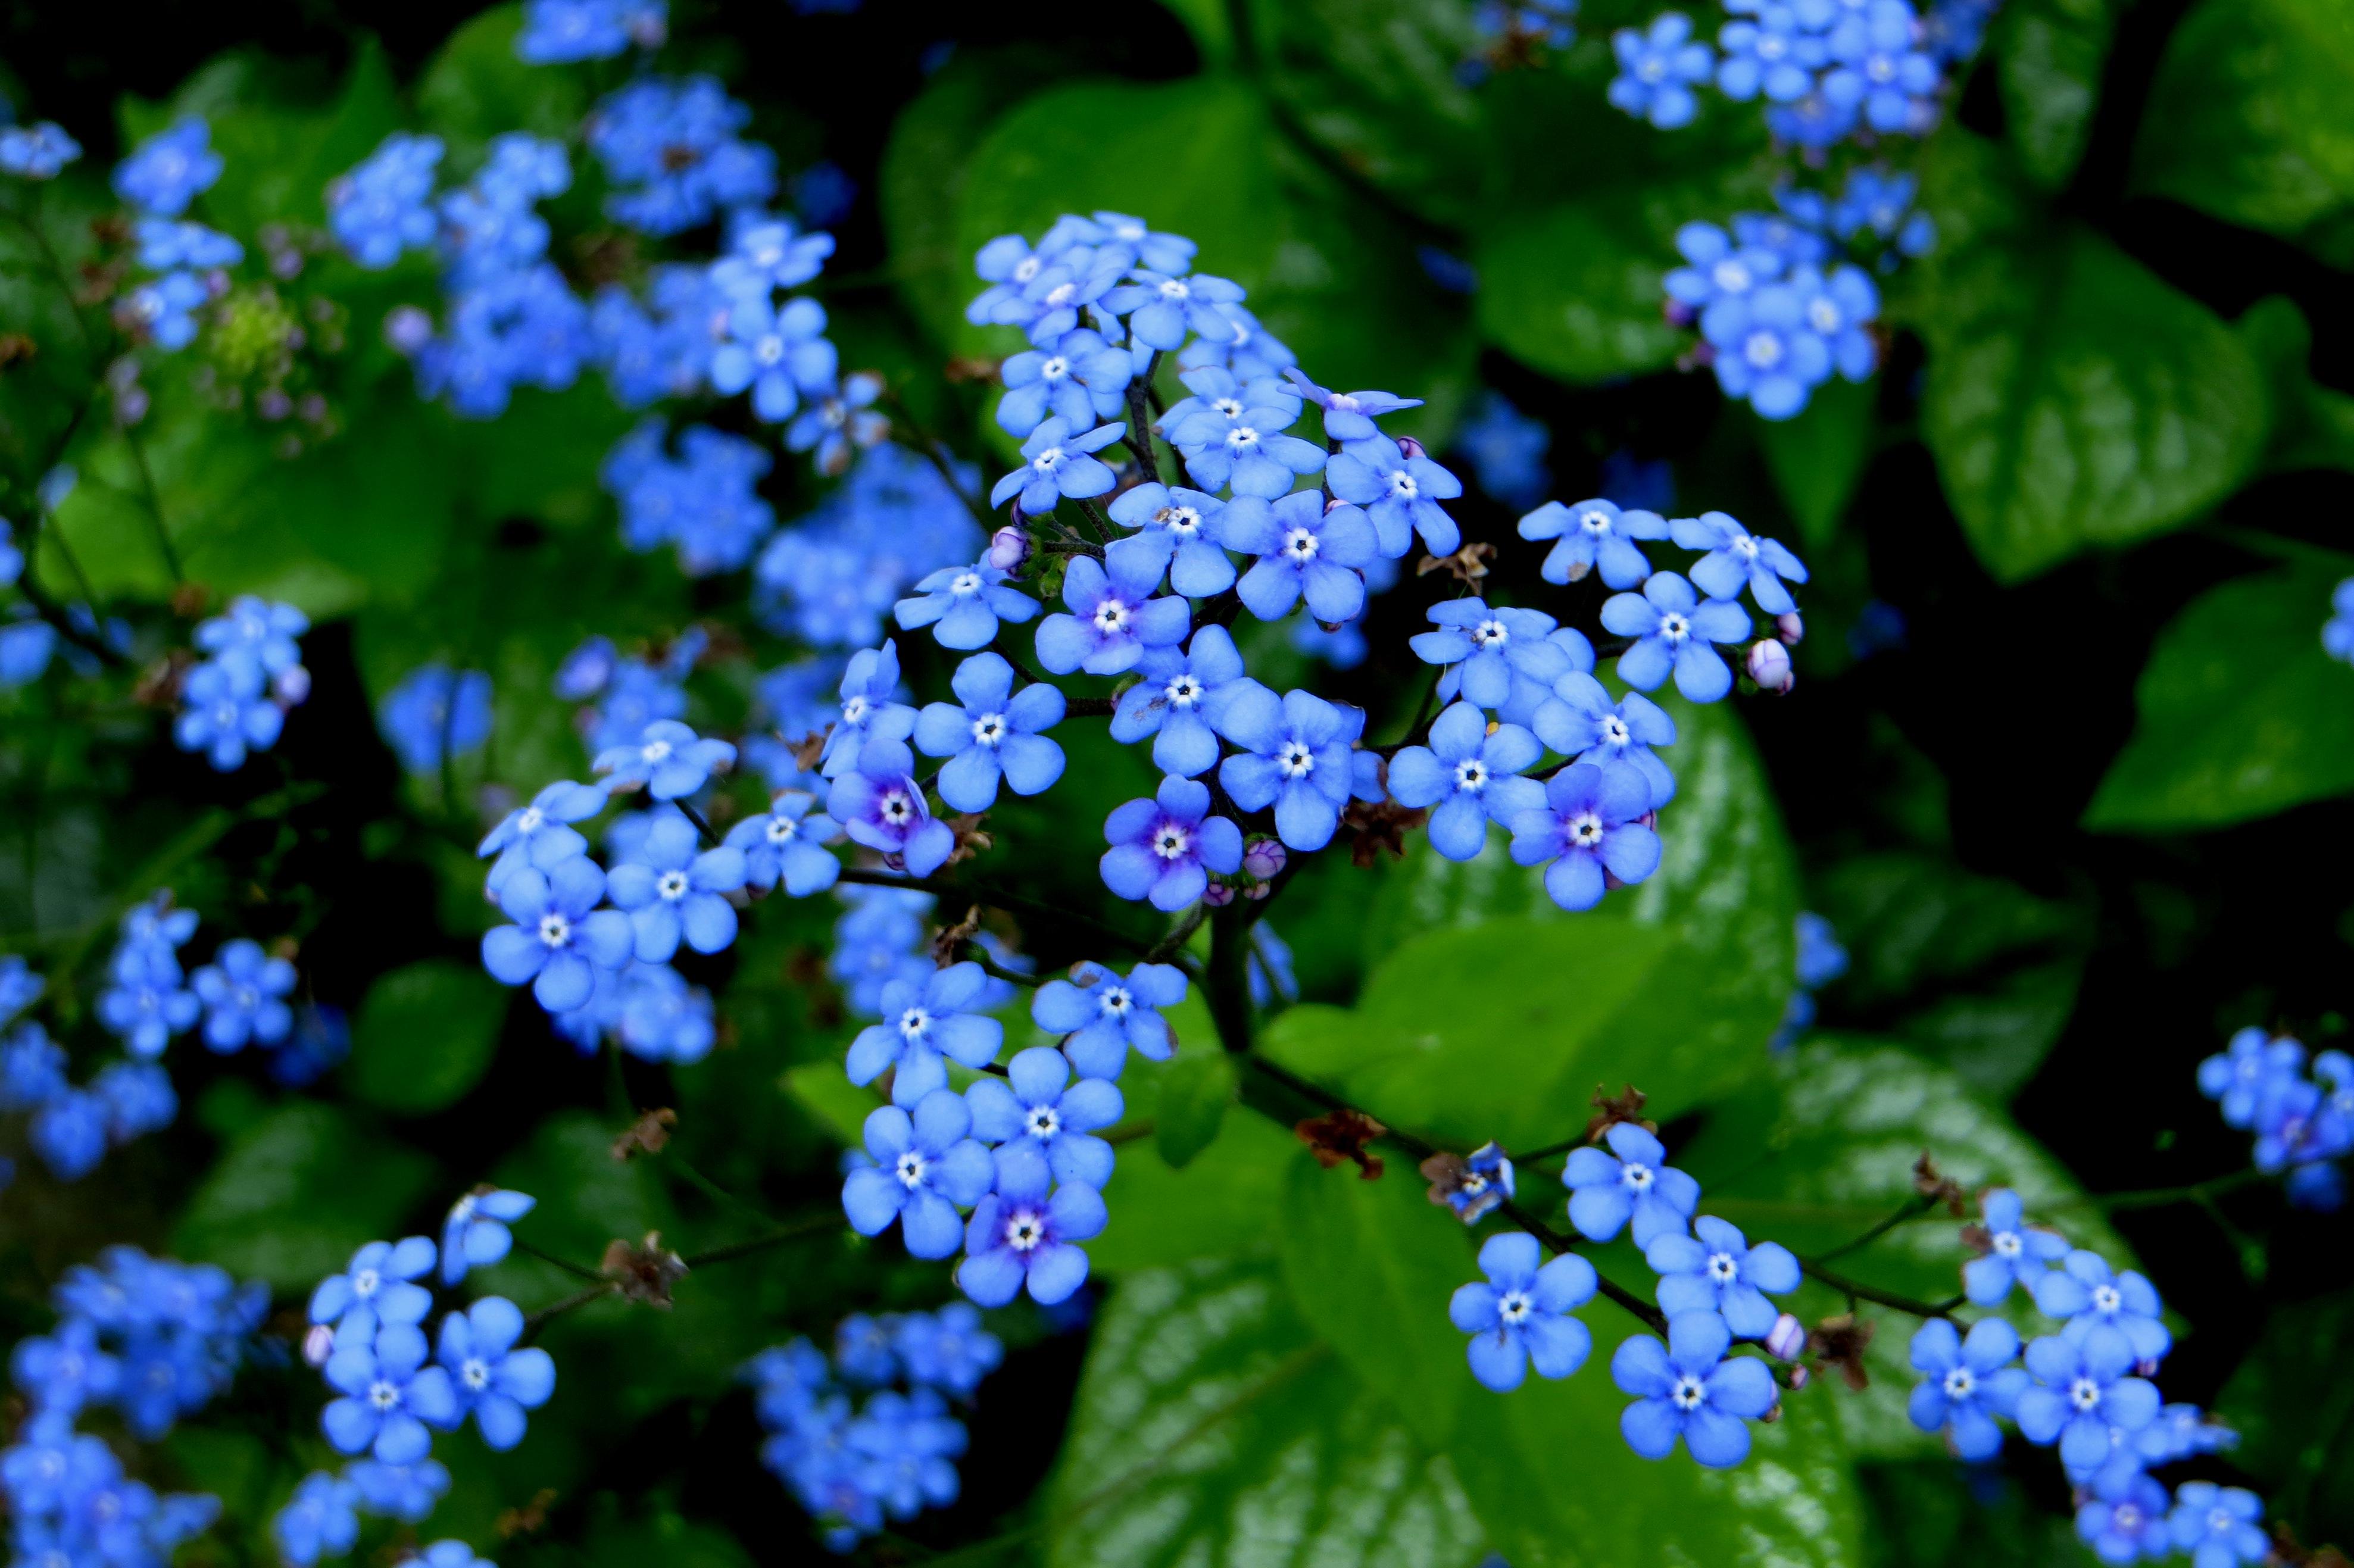 Small blue flowers enthusiastic gardener brunnera jack frost in flower izmirmasajfo